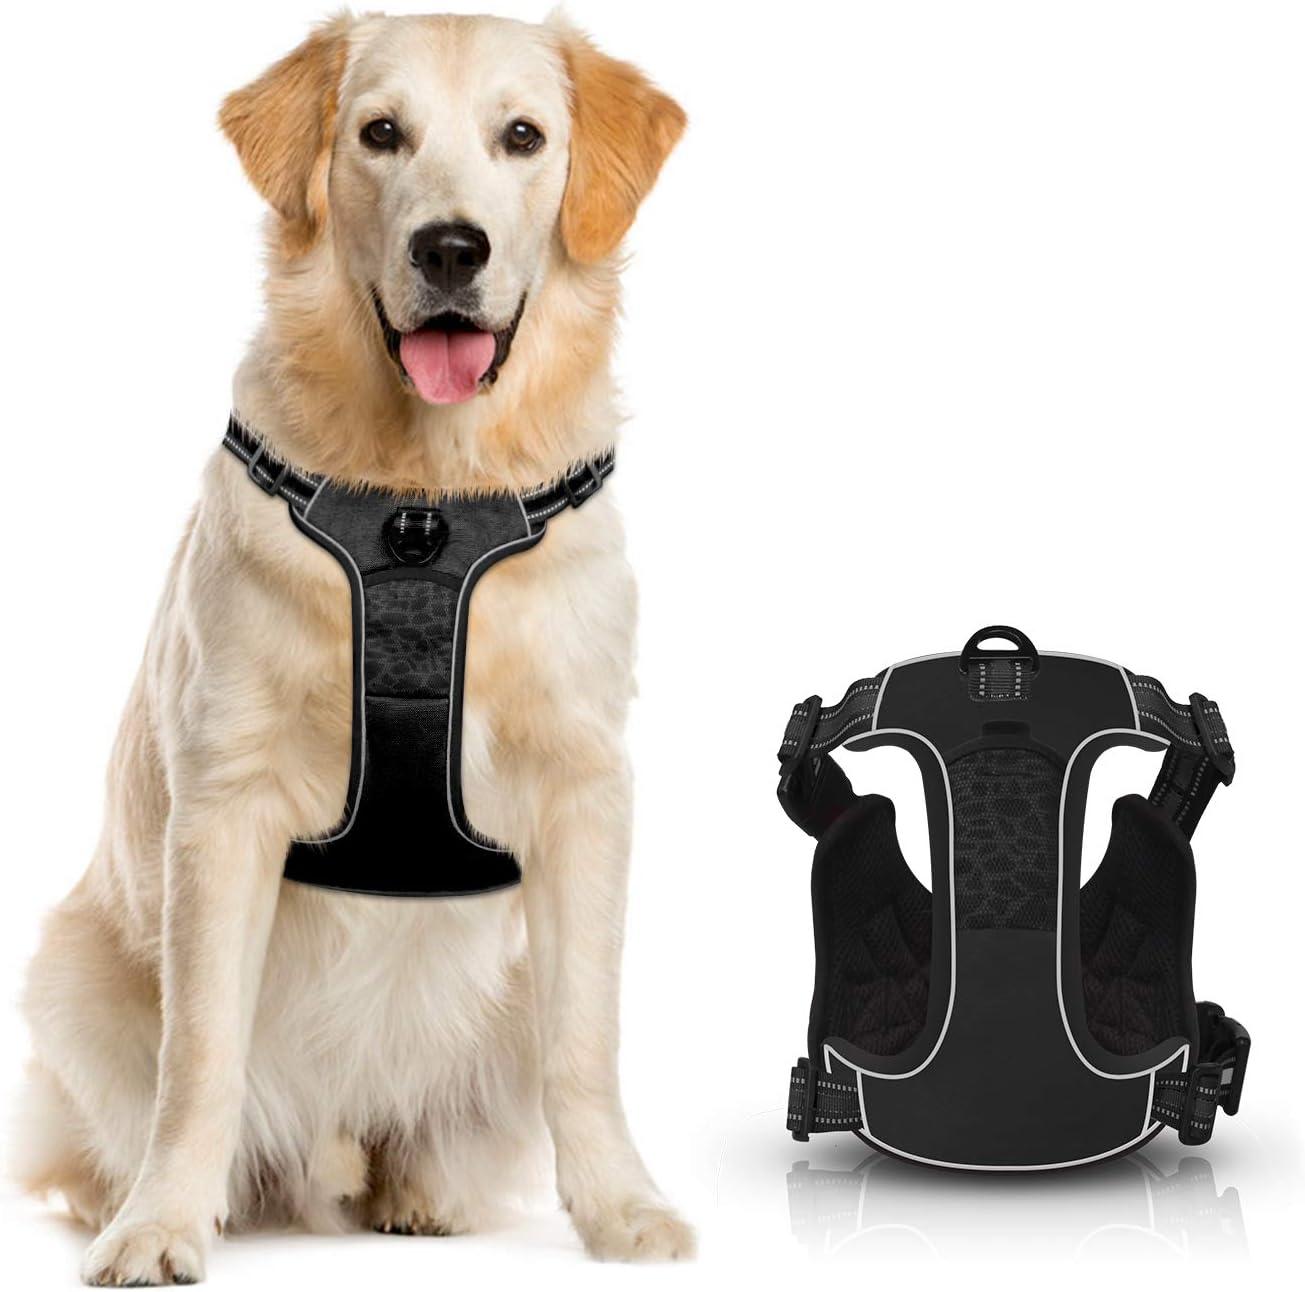 67i No Pull Dog unisex Harness w Pet Adjustable Al sold out. Reflective Vest